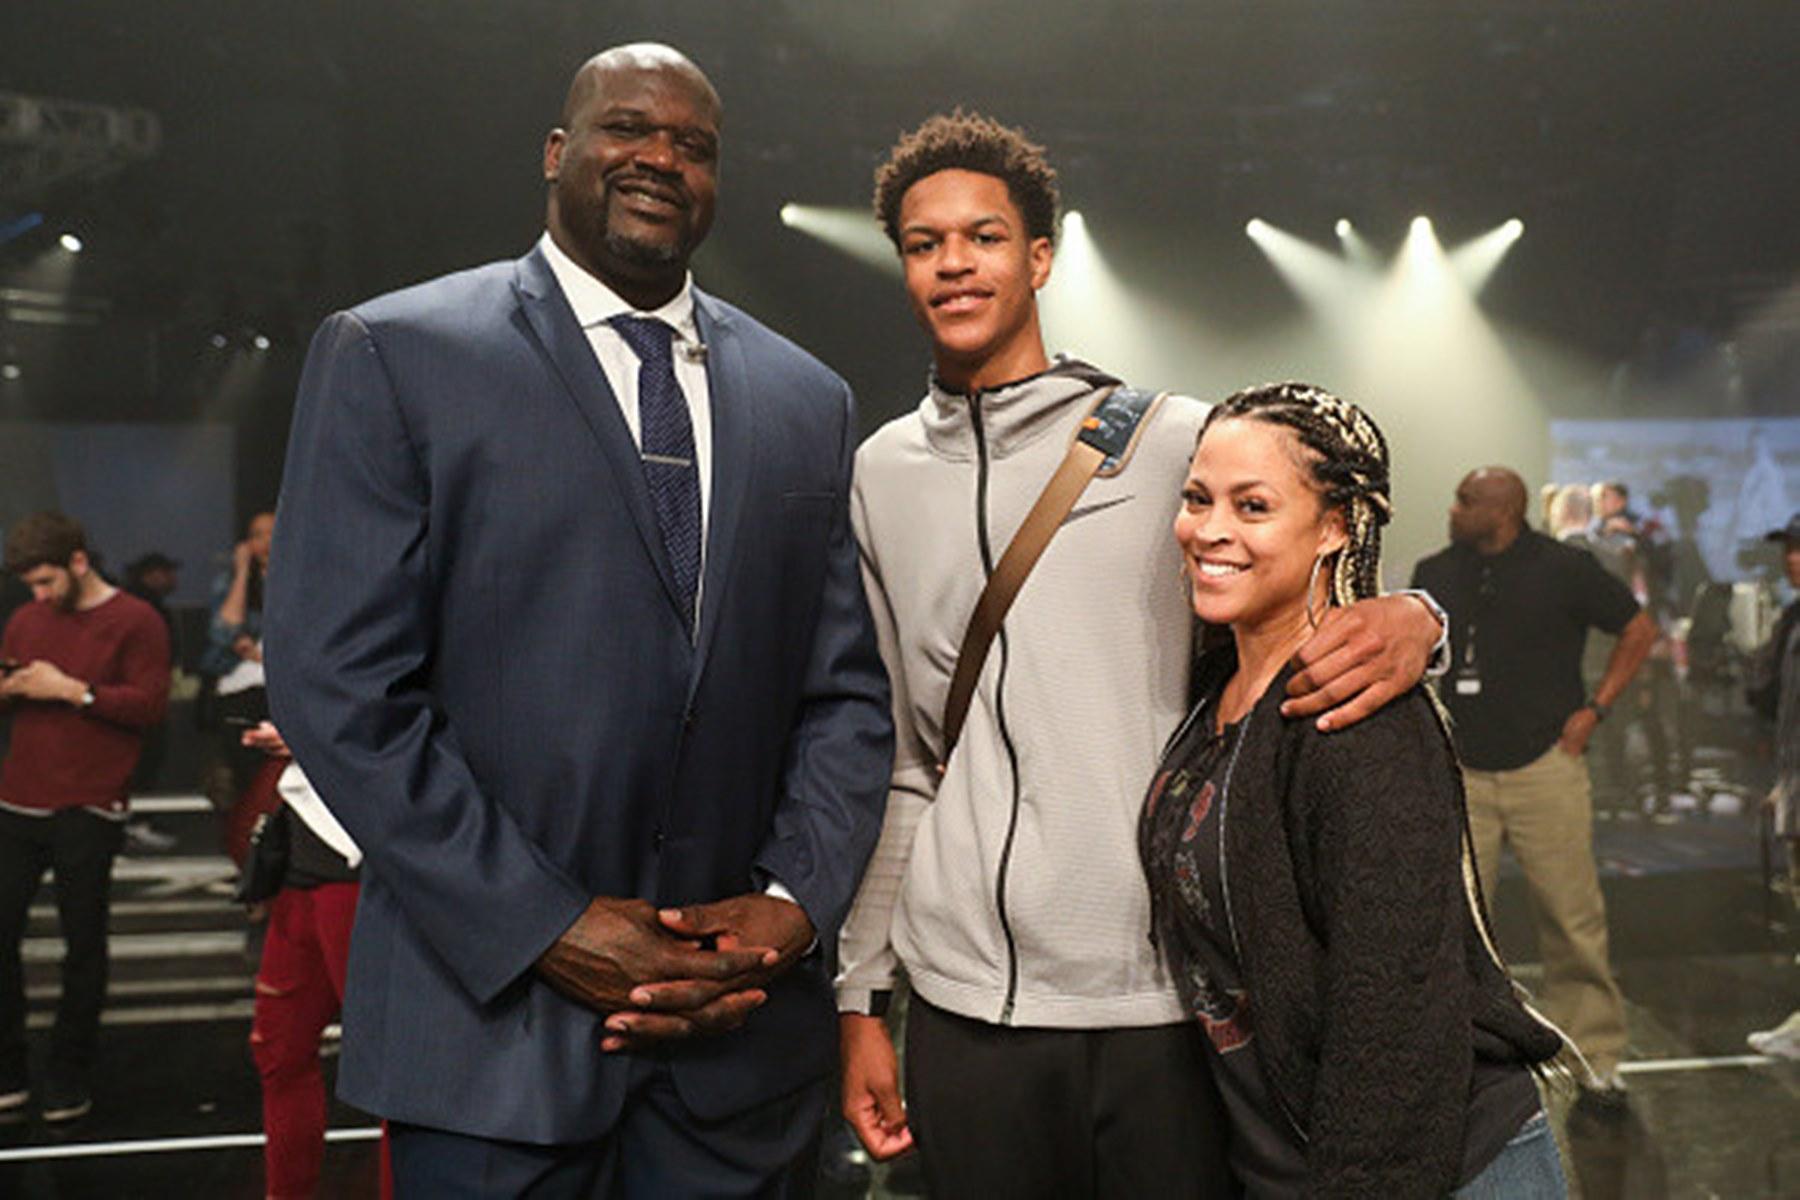 Shaquille O'Neal Shareef Shaunie Kobe Bryant